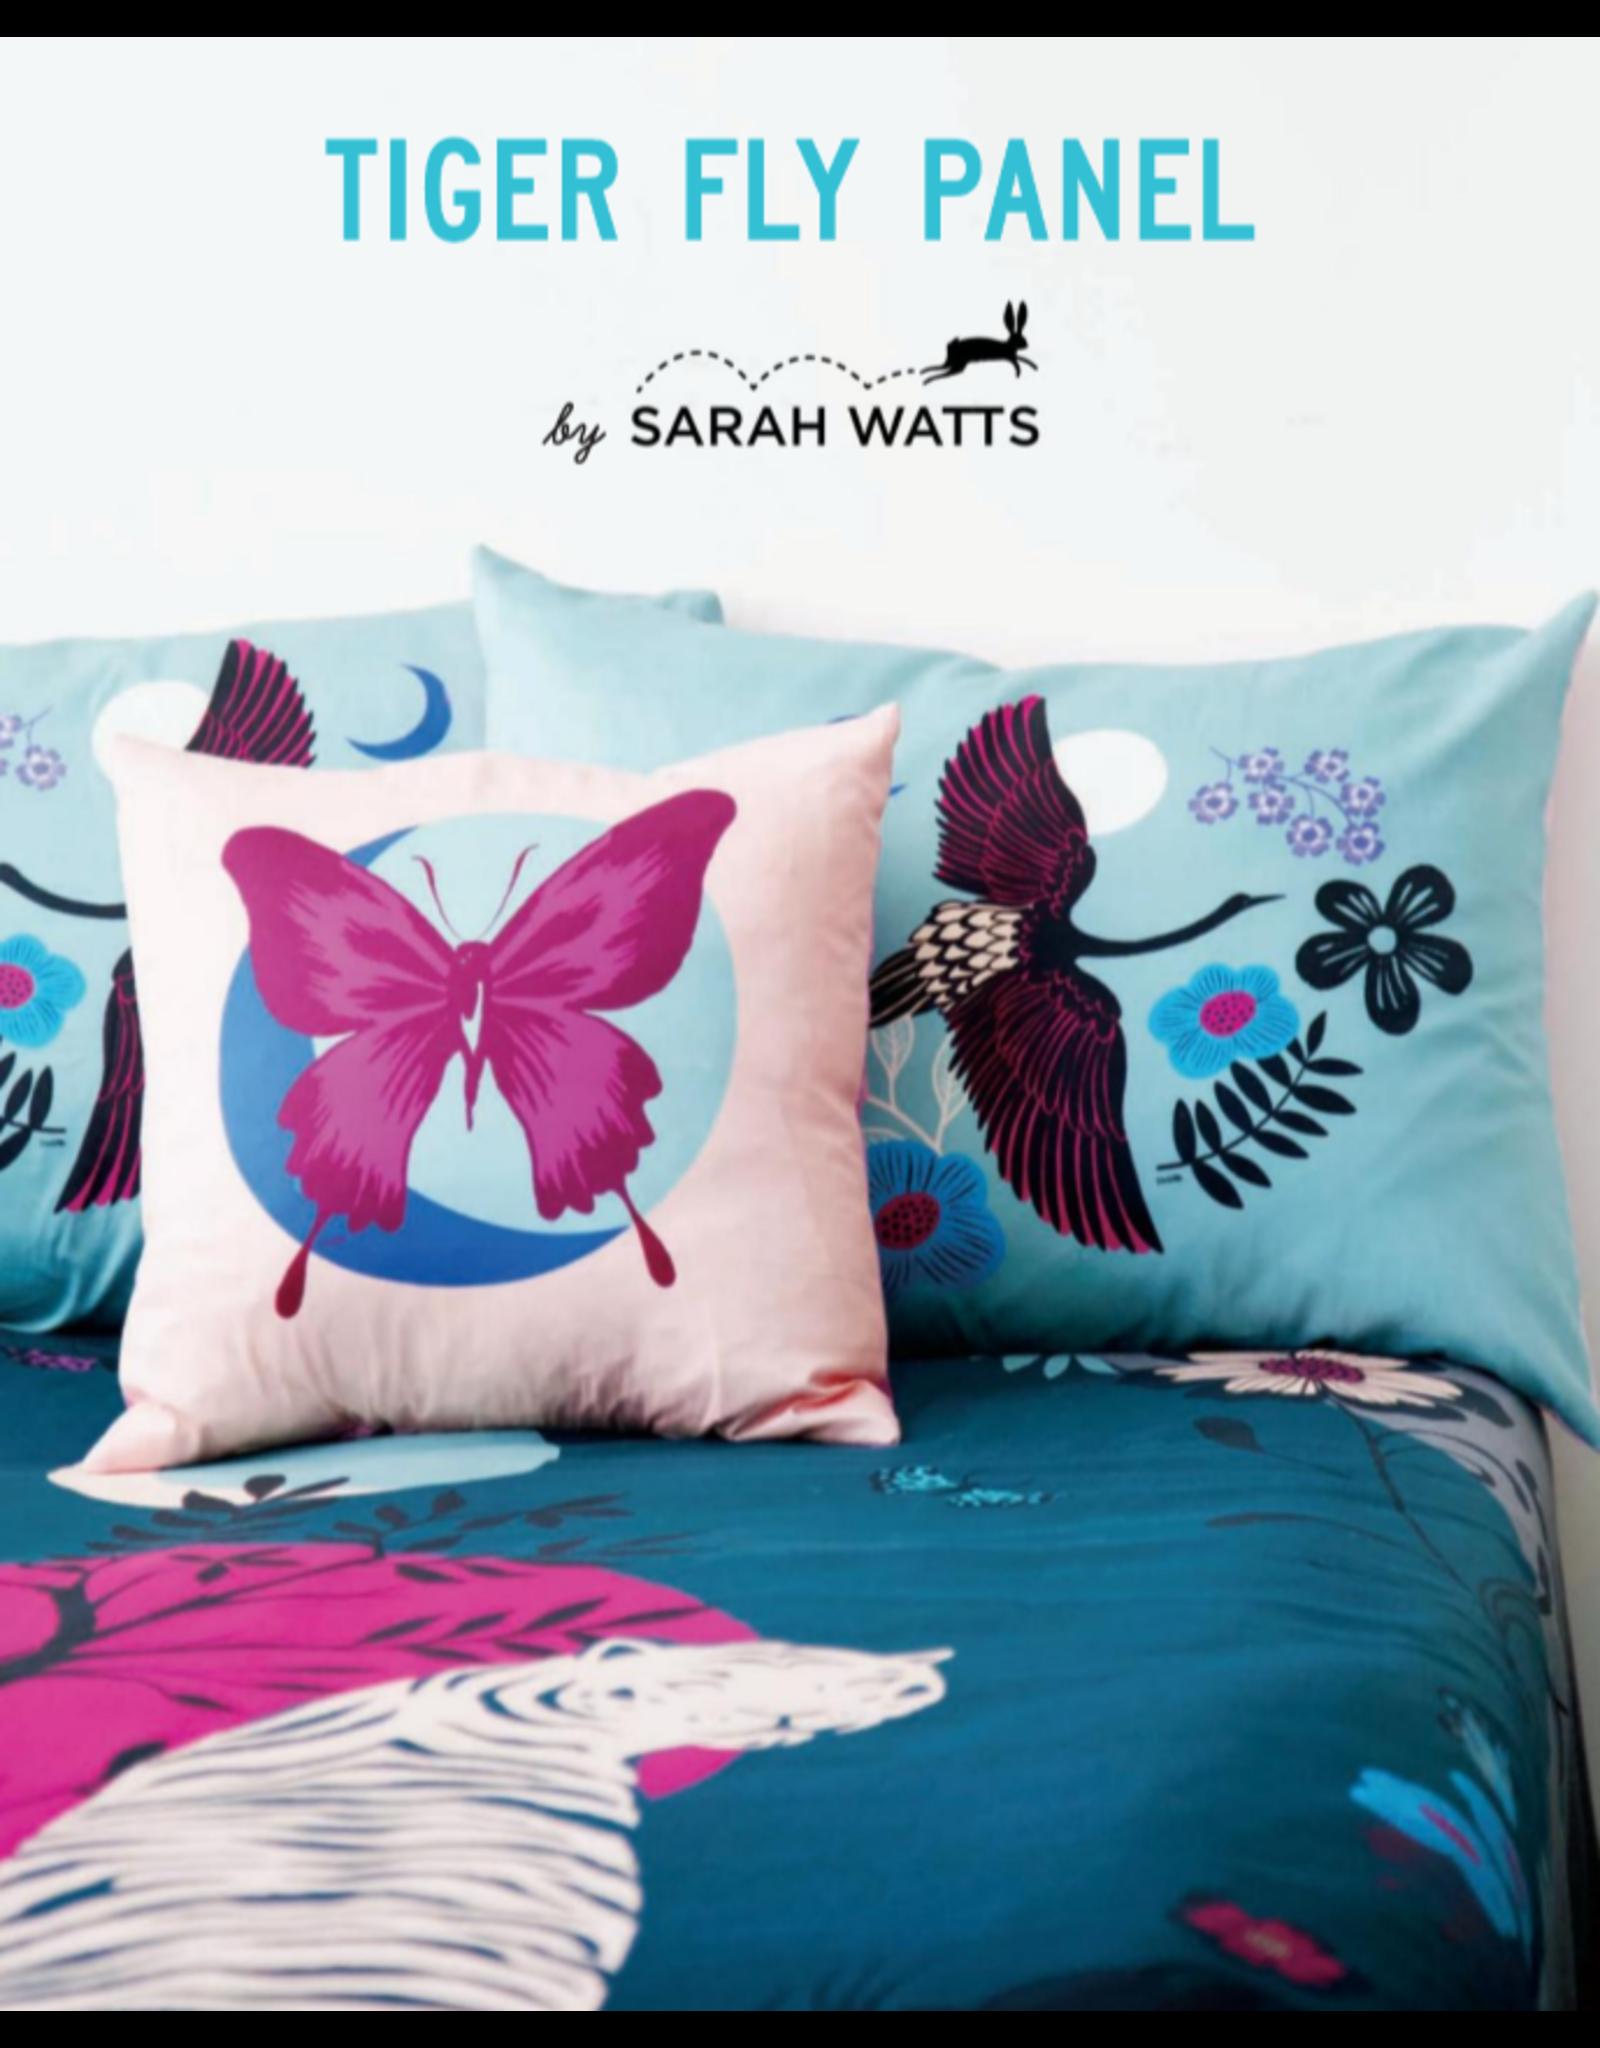 Sarah Watts ON SALE-Ruby Star Society, Tiger Fly Large Fabric Panel, Digitally Printed